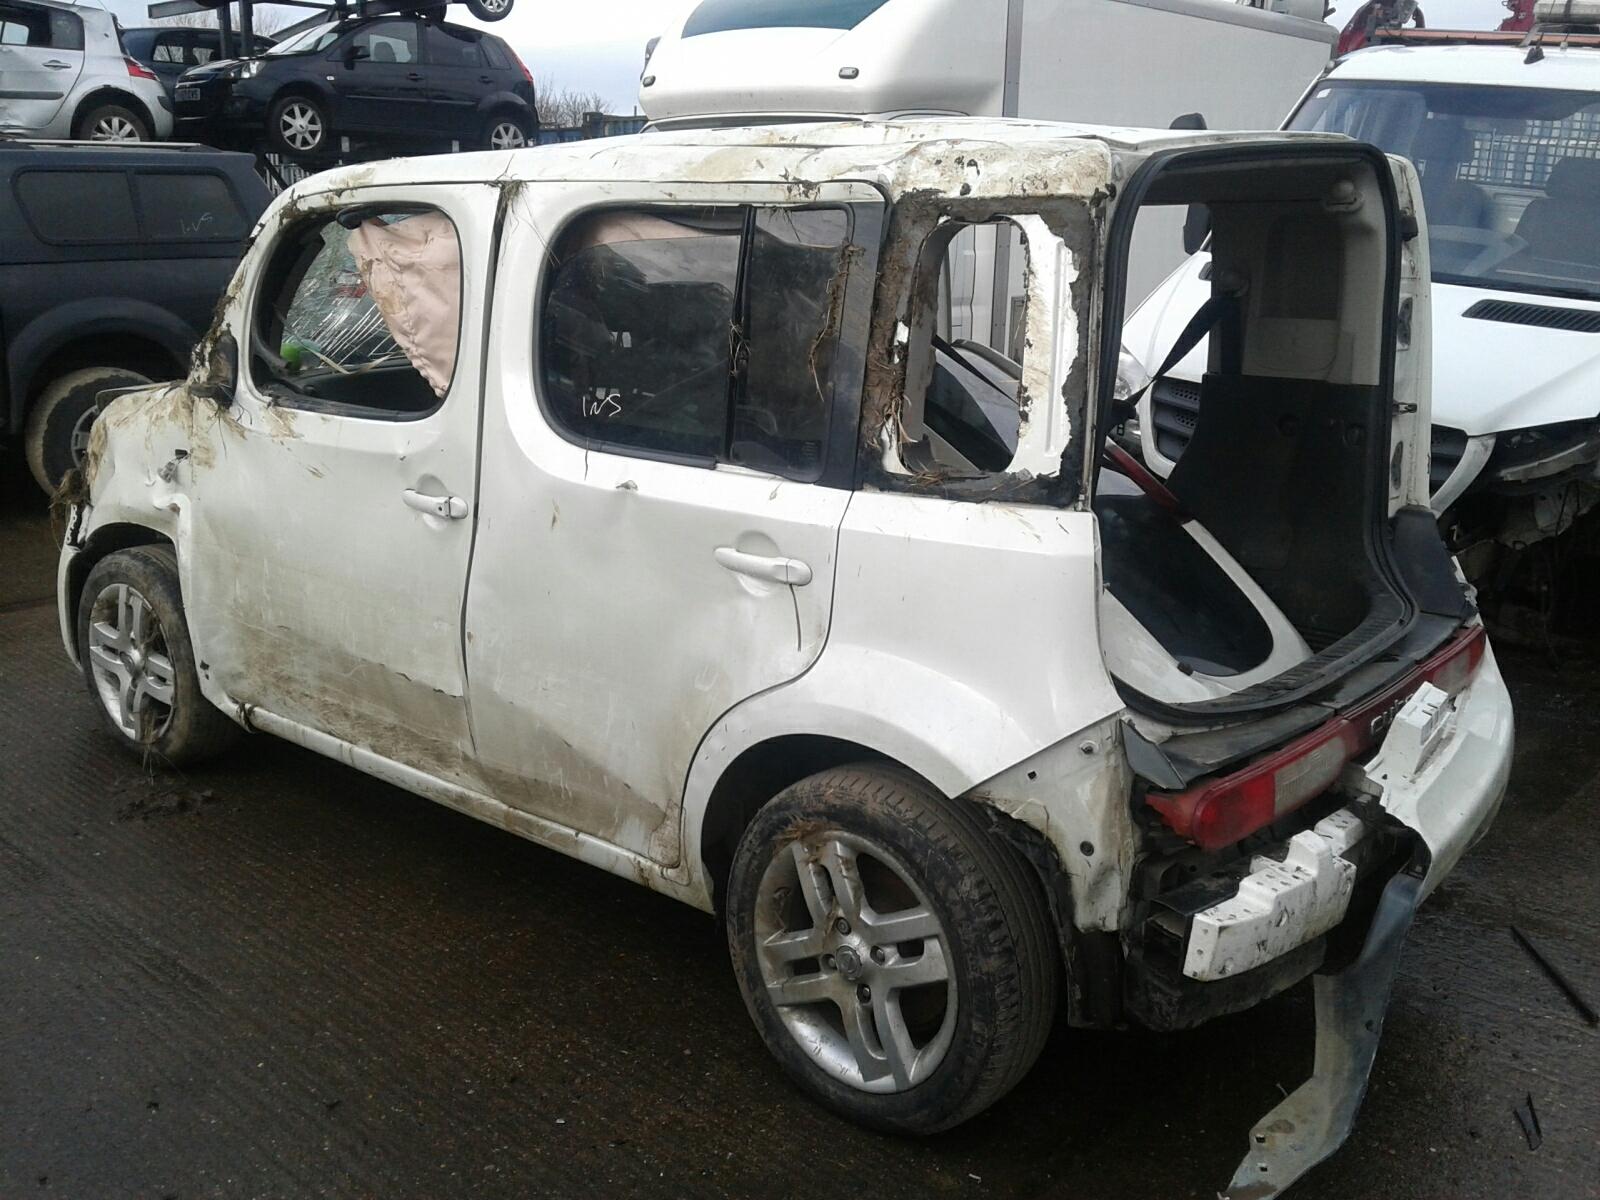 hight resolution of  nissan cube 2010 on 5 door hatchback